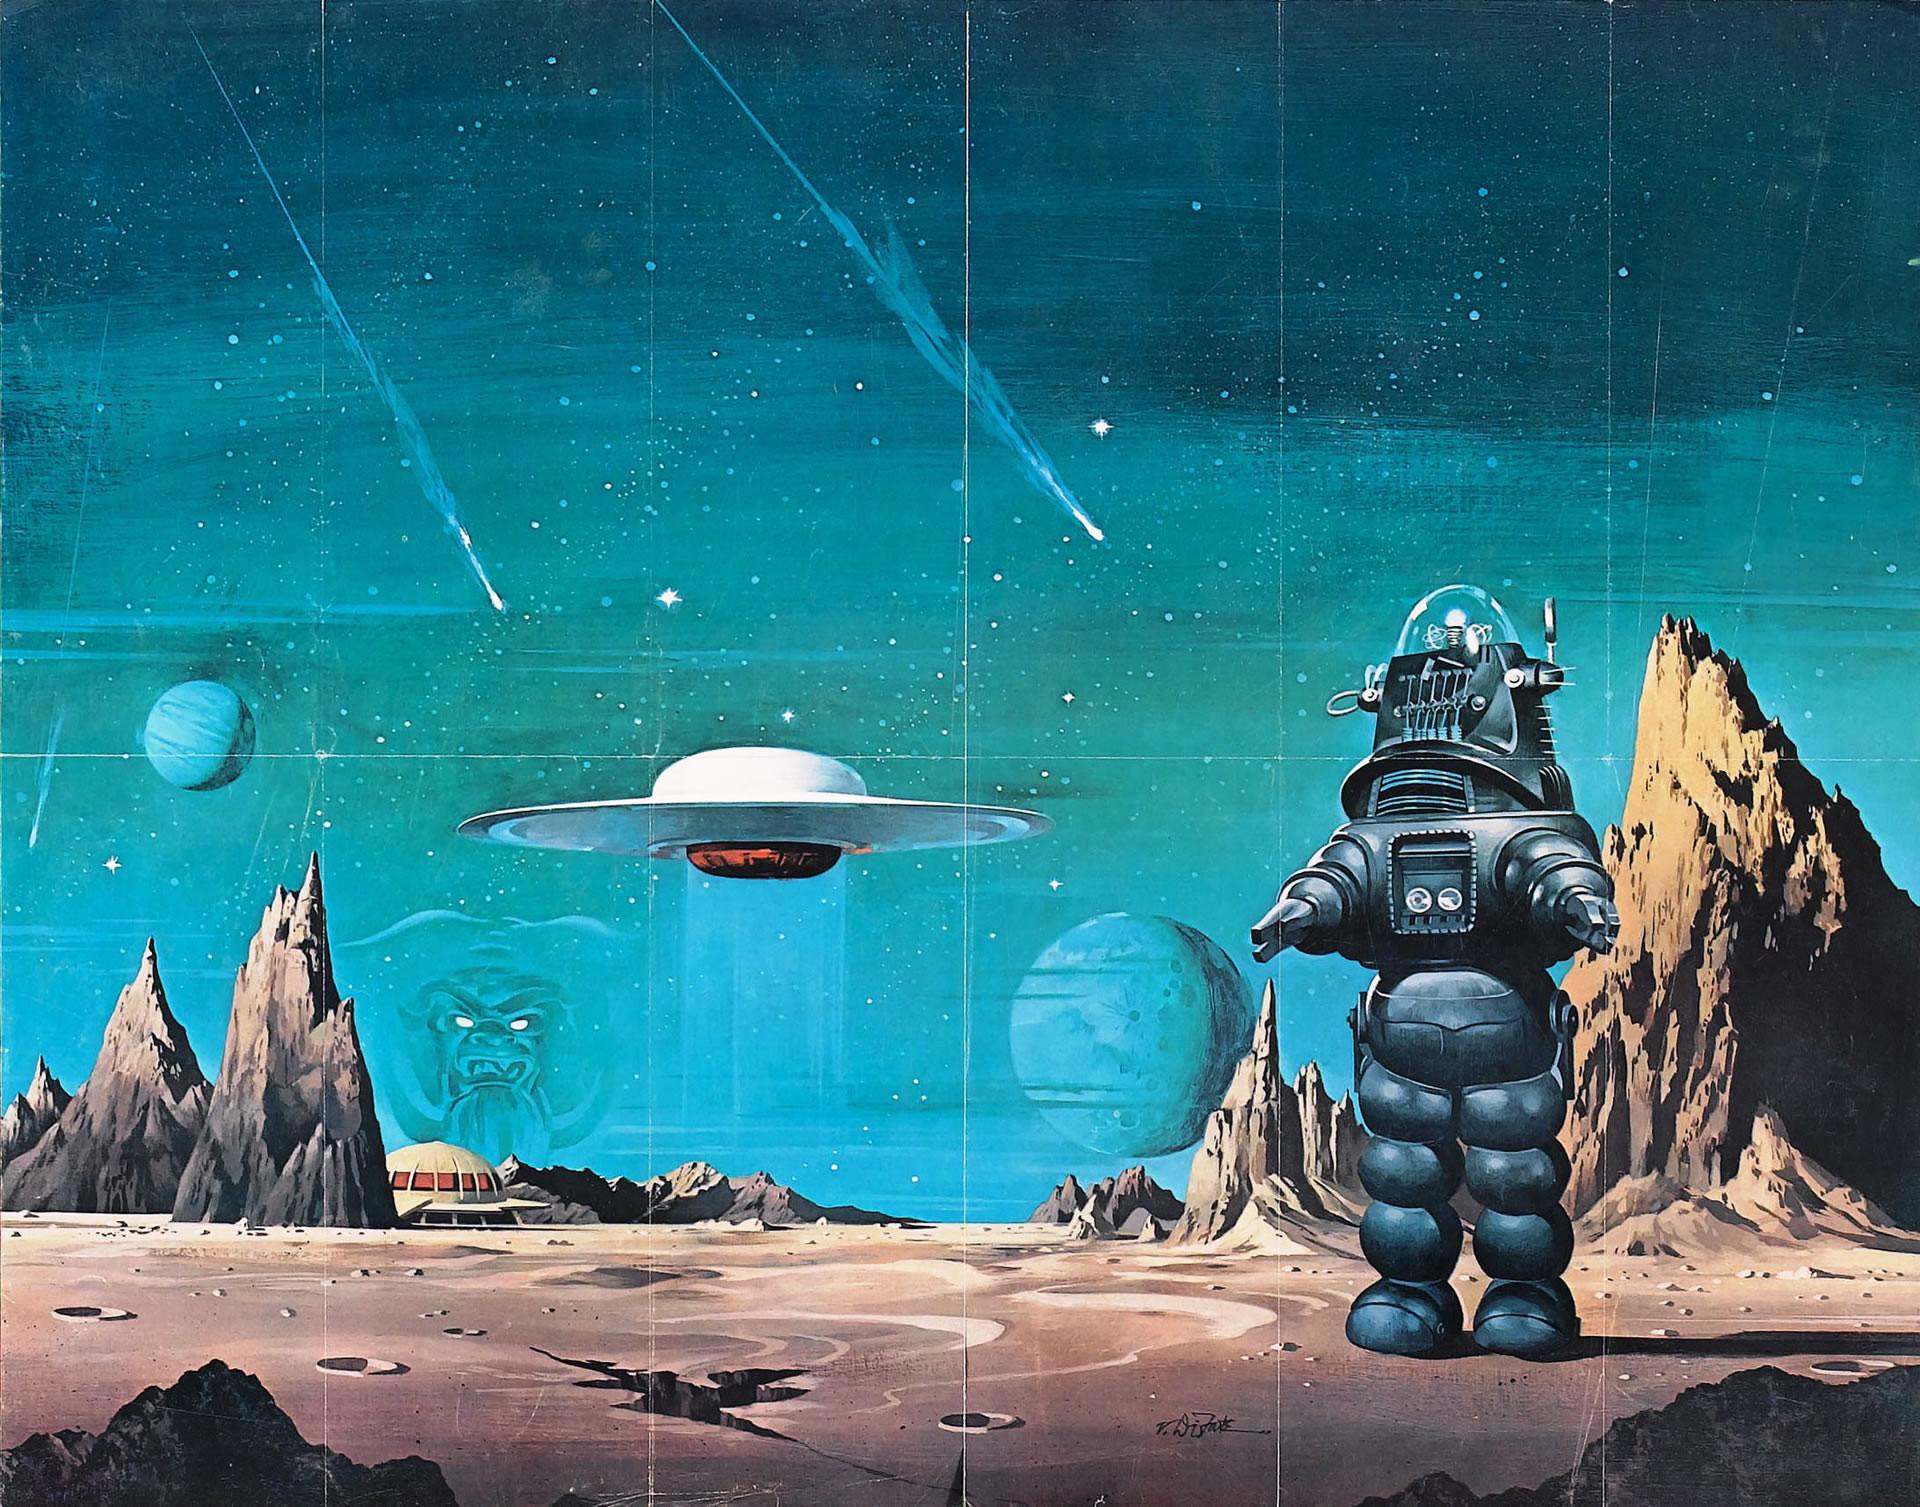 1920x1507 Some Retro Sci Fi Wallpaper For You Guys